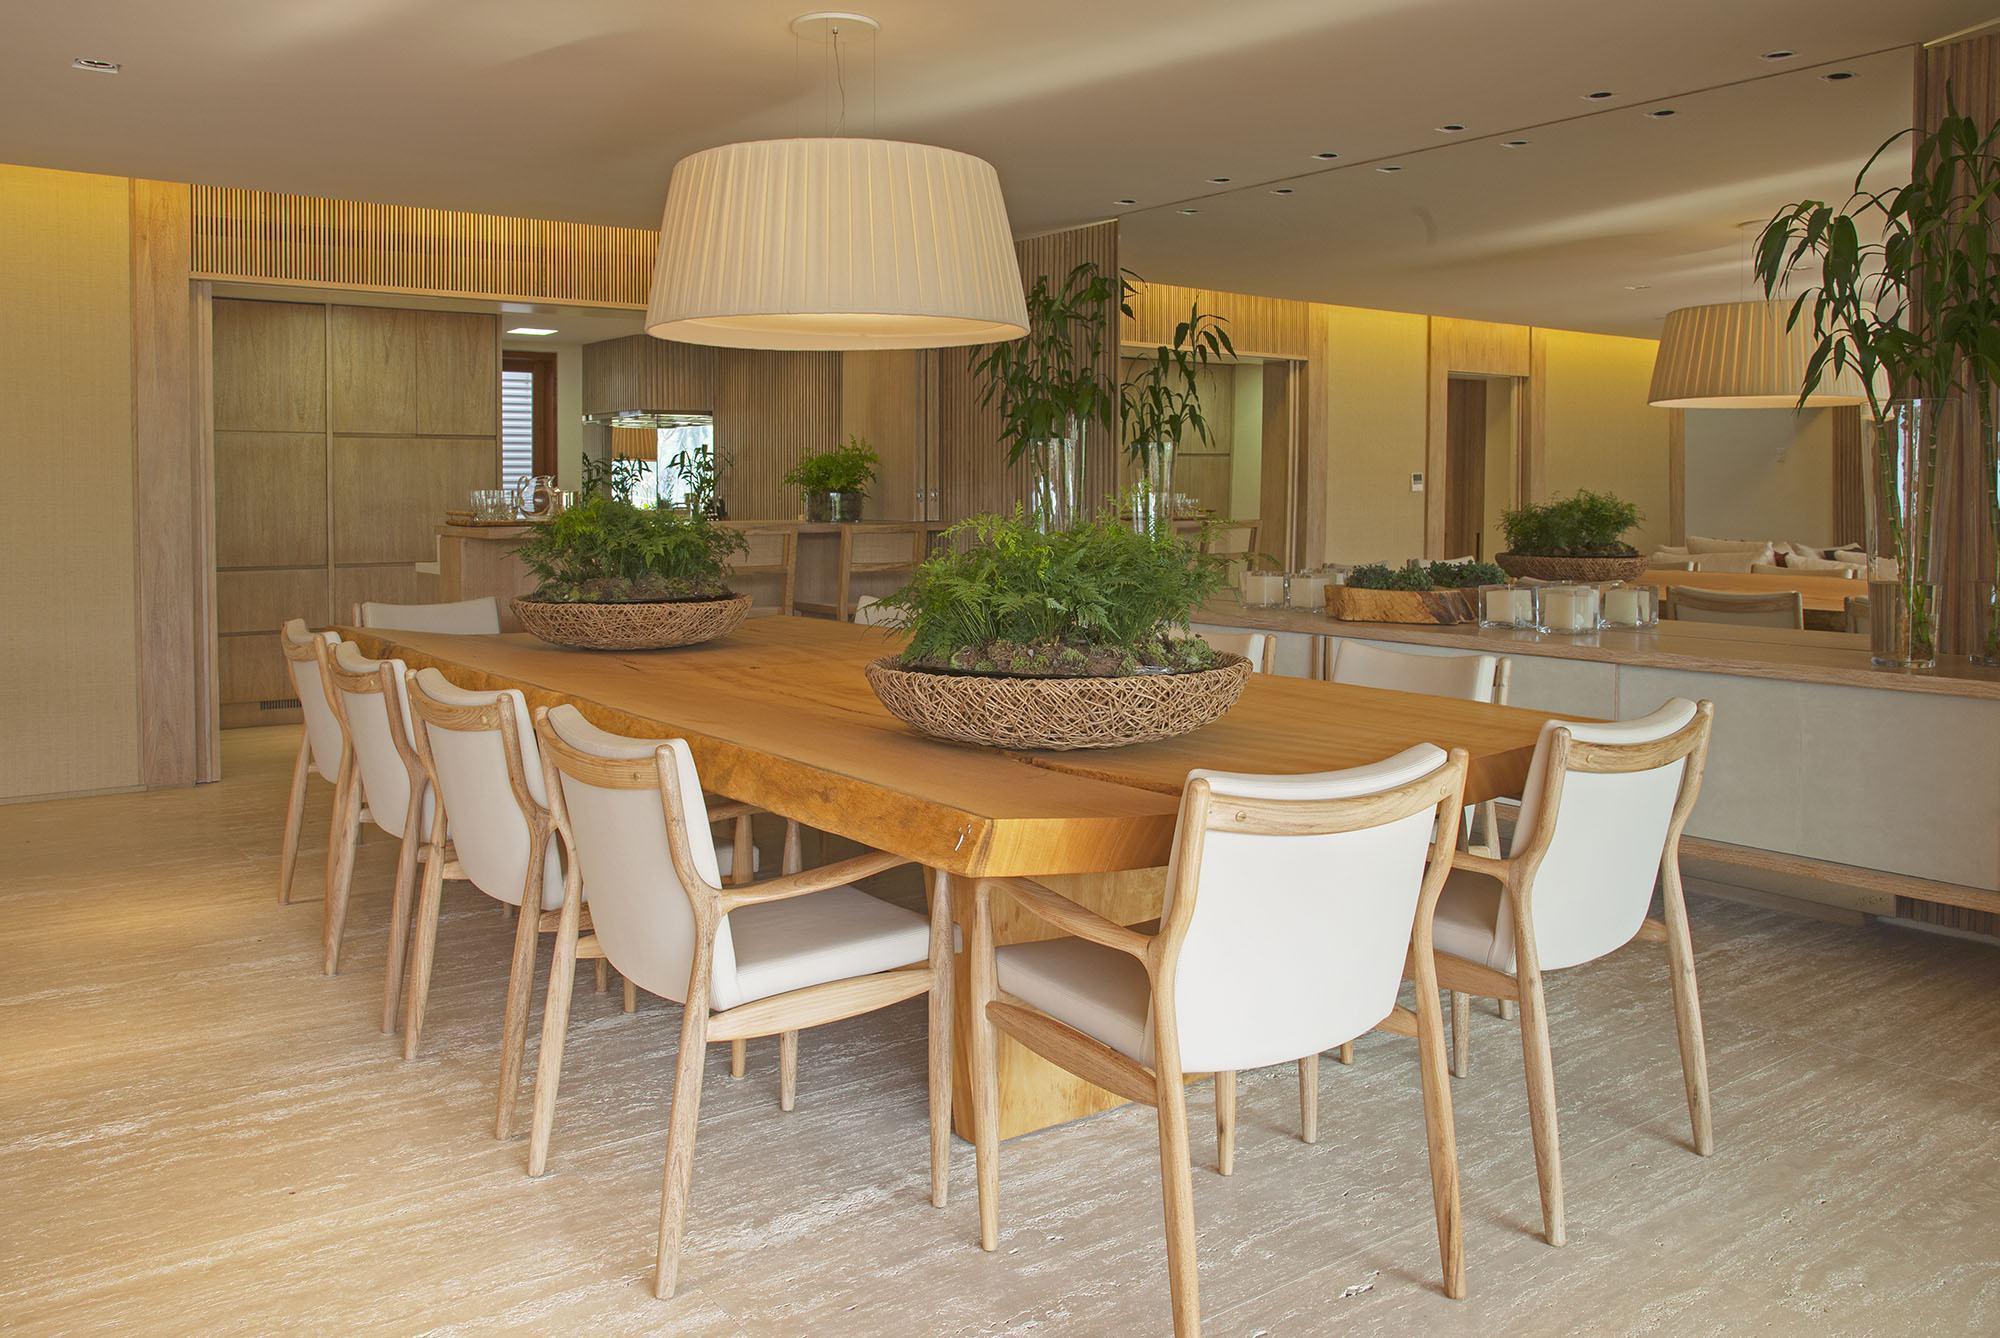 Parede Sala De Jantar Rustica - Sala De Jantar Moderna 60 Modelos Fotos Lindas